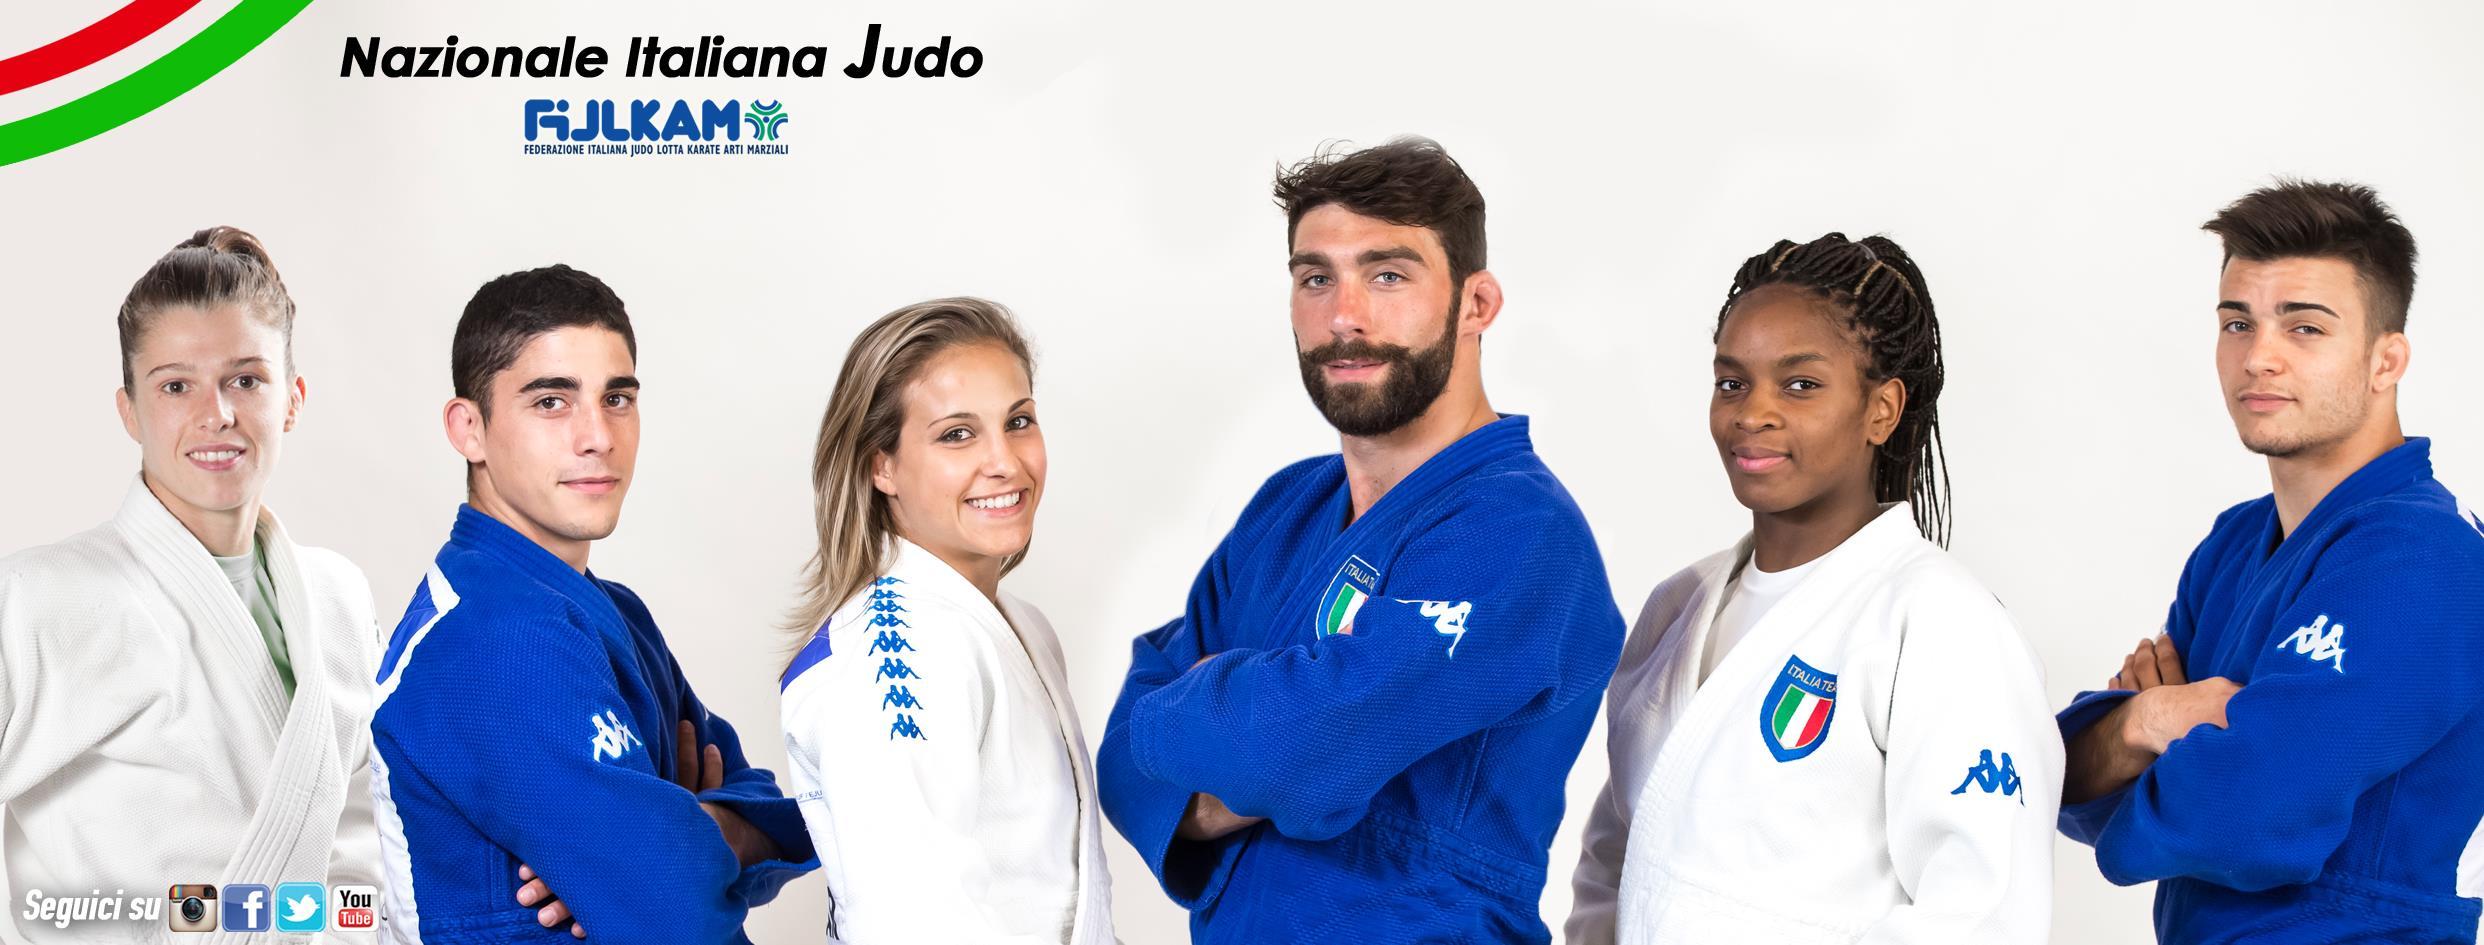 Squadra Judo RIO